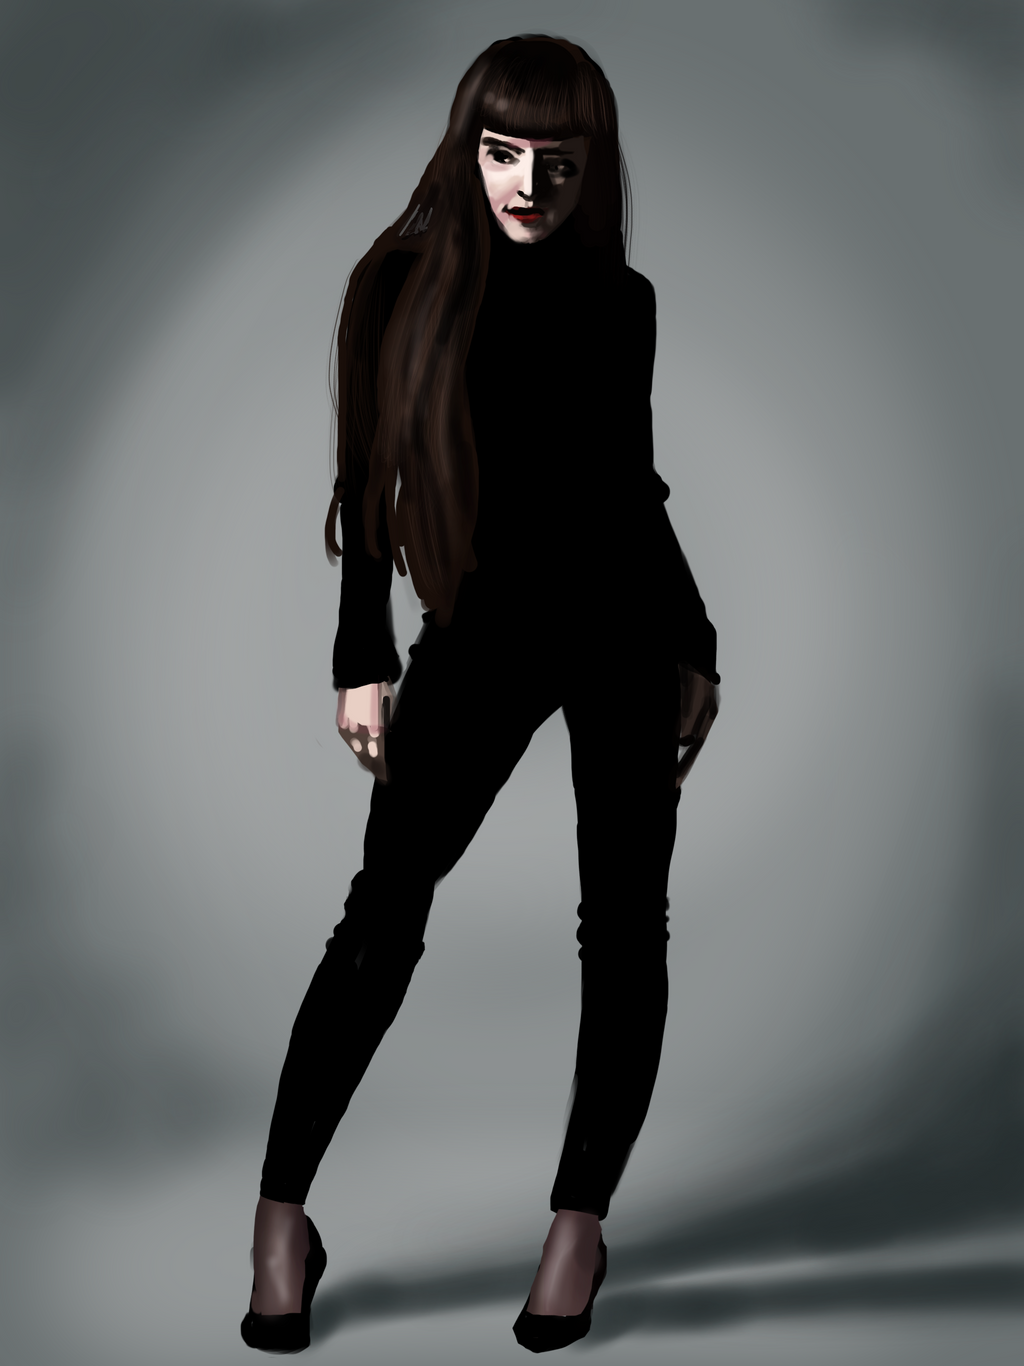 Portrait 49 by stevenf